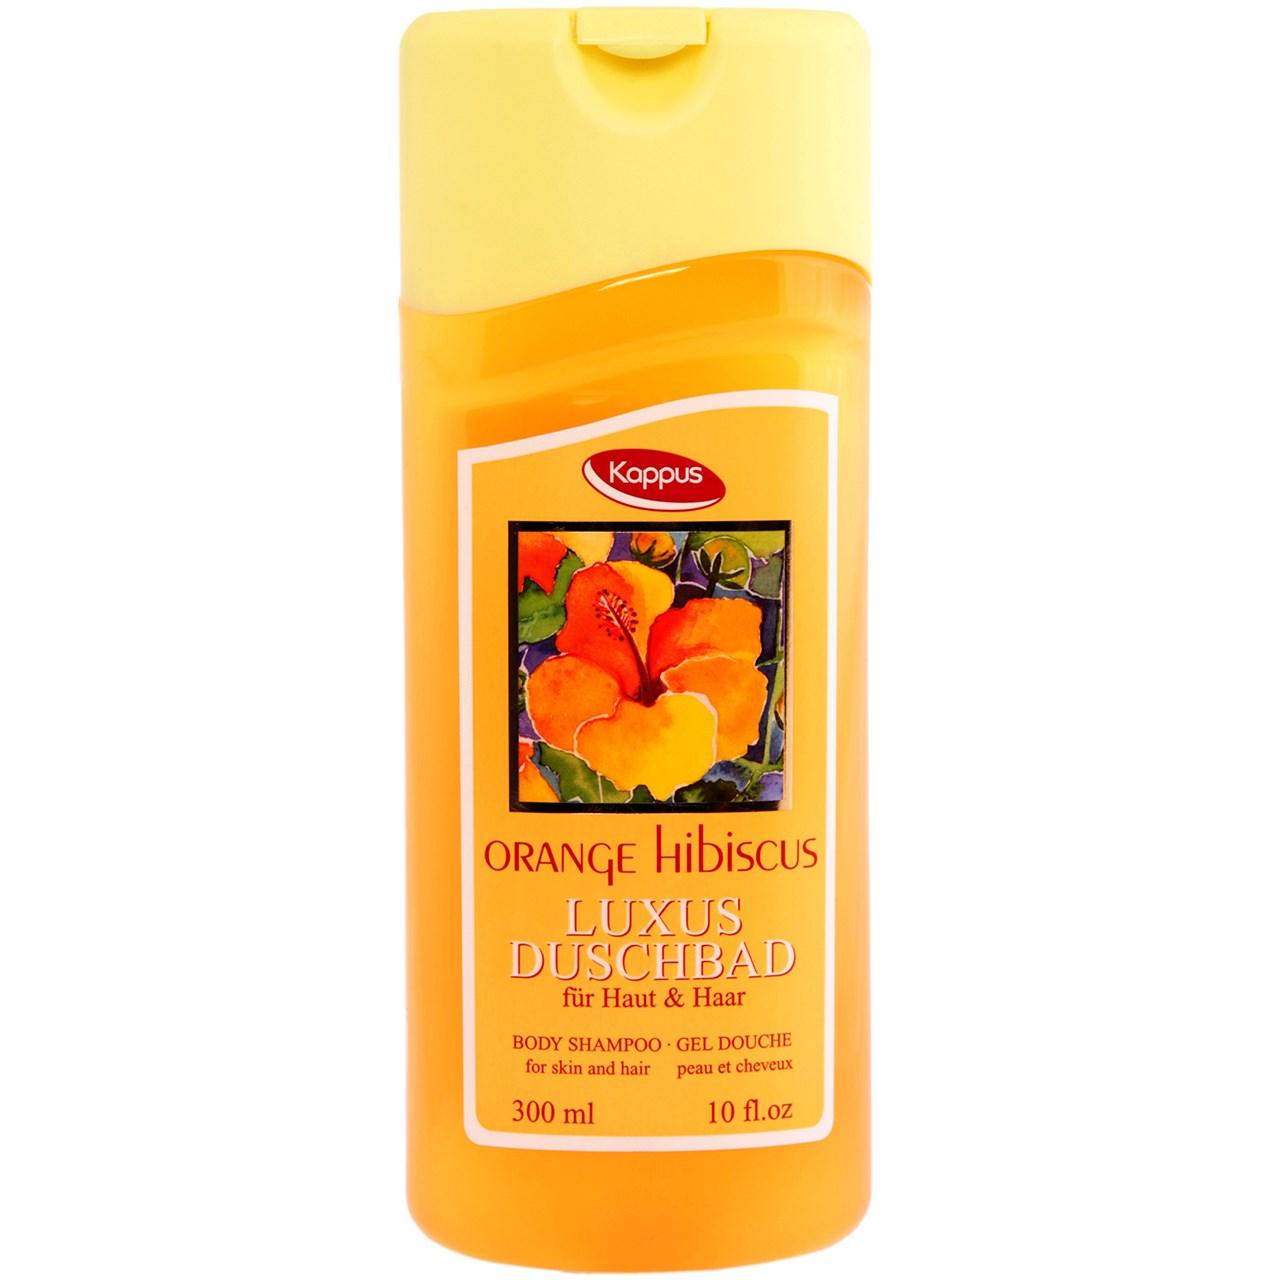 خرید                      شامپو سر و بدن کاپوس مدل Orange Hibiscus حجم 300 میلی لیتر